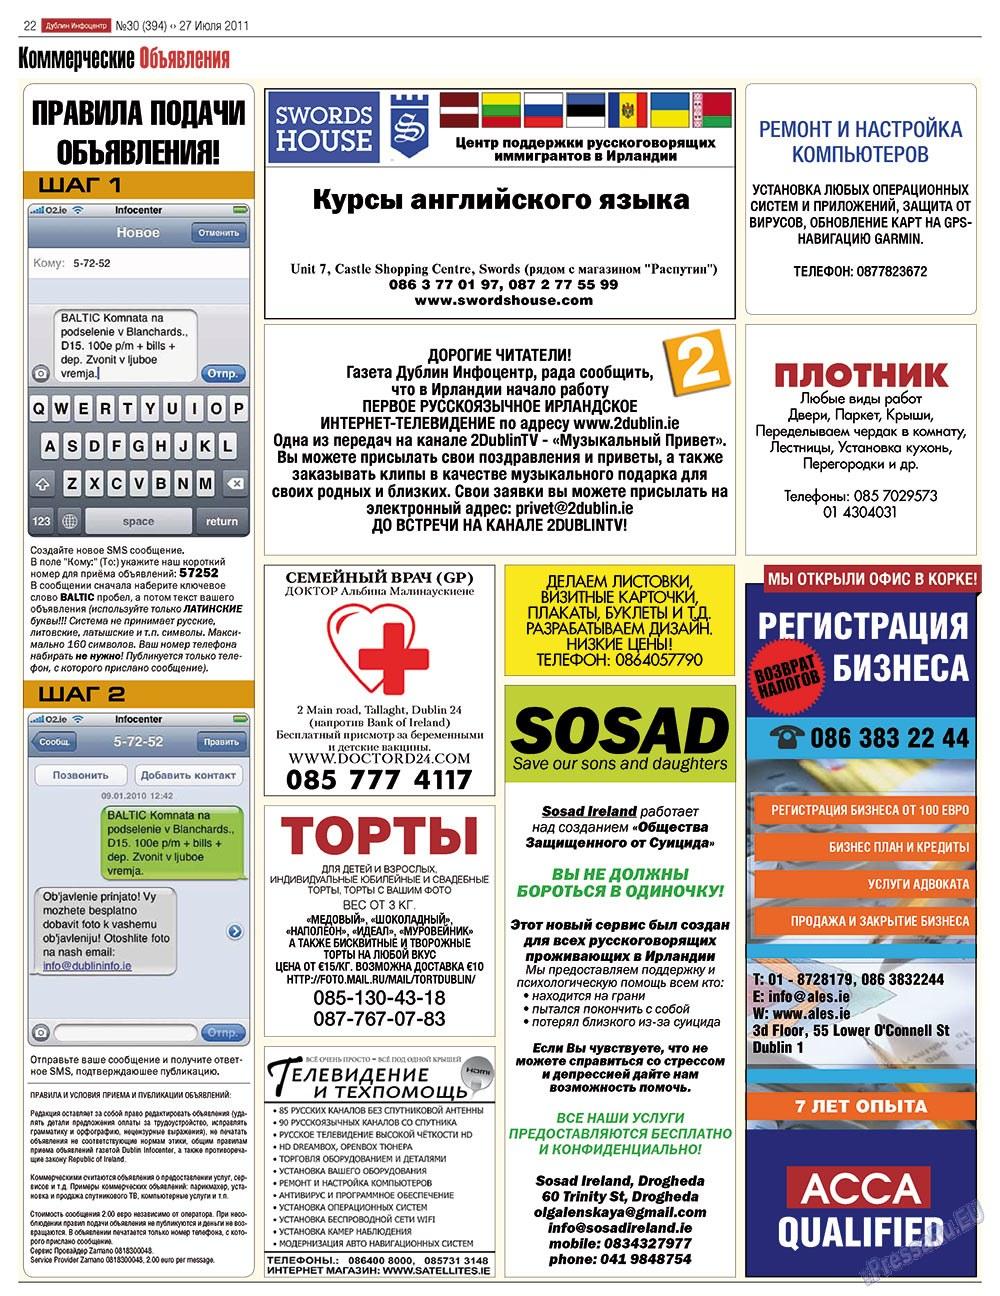 Дублин инфоцентр (газета). 2011 год, номер 30, стр. 22